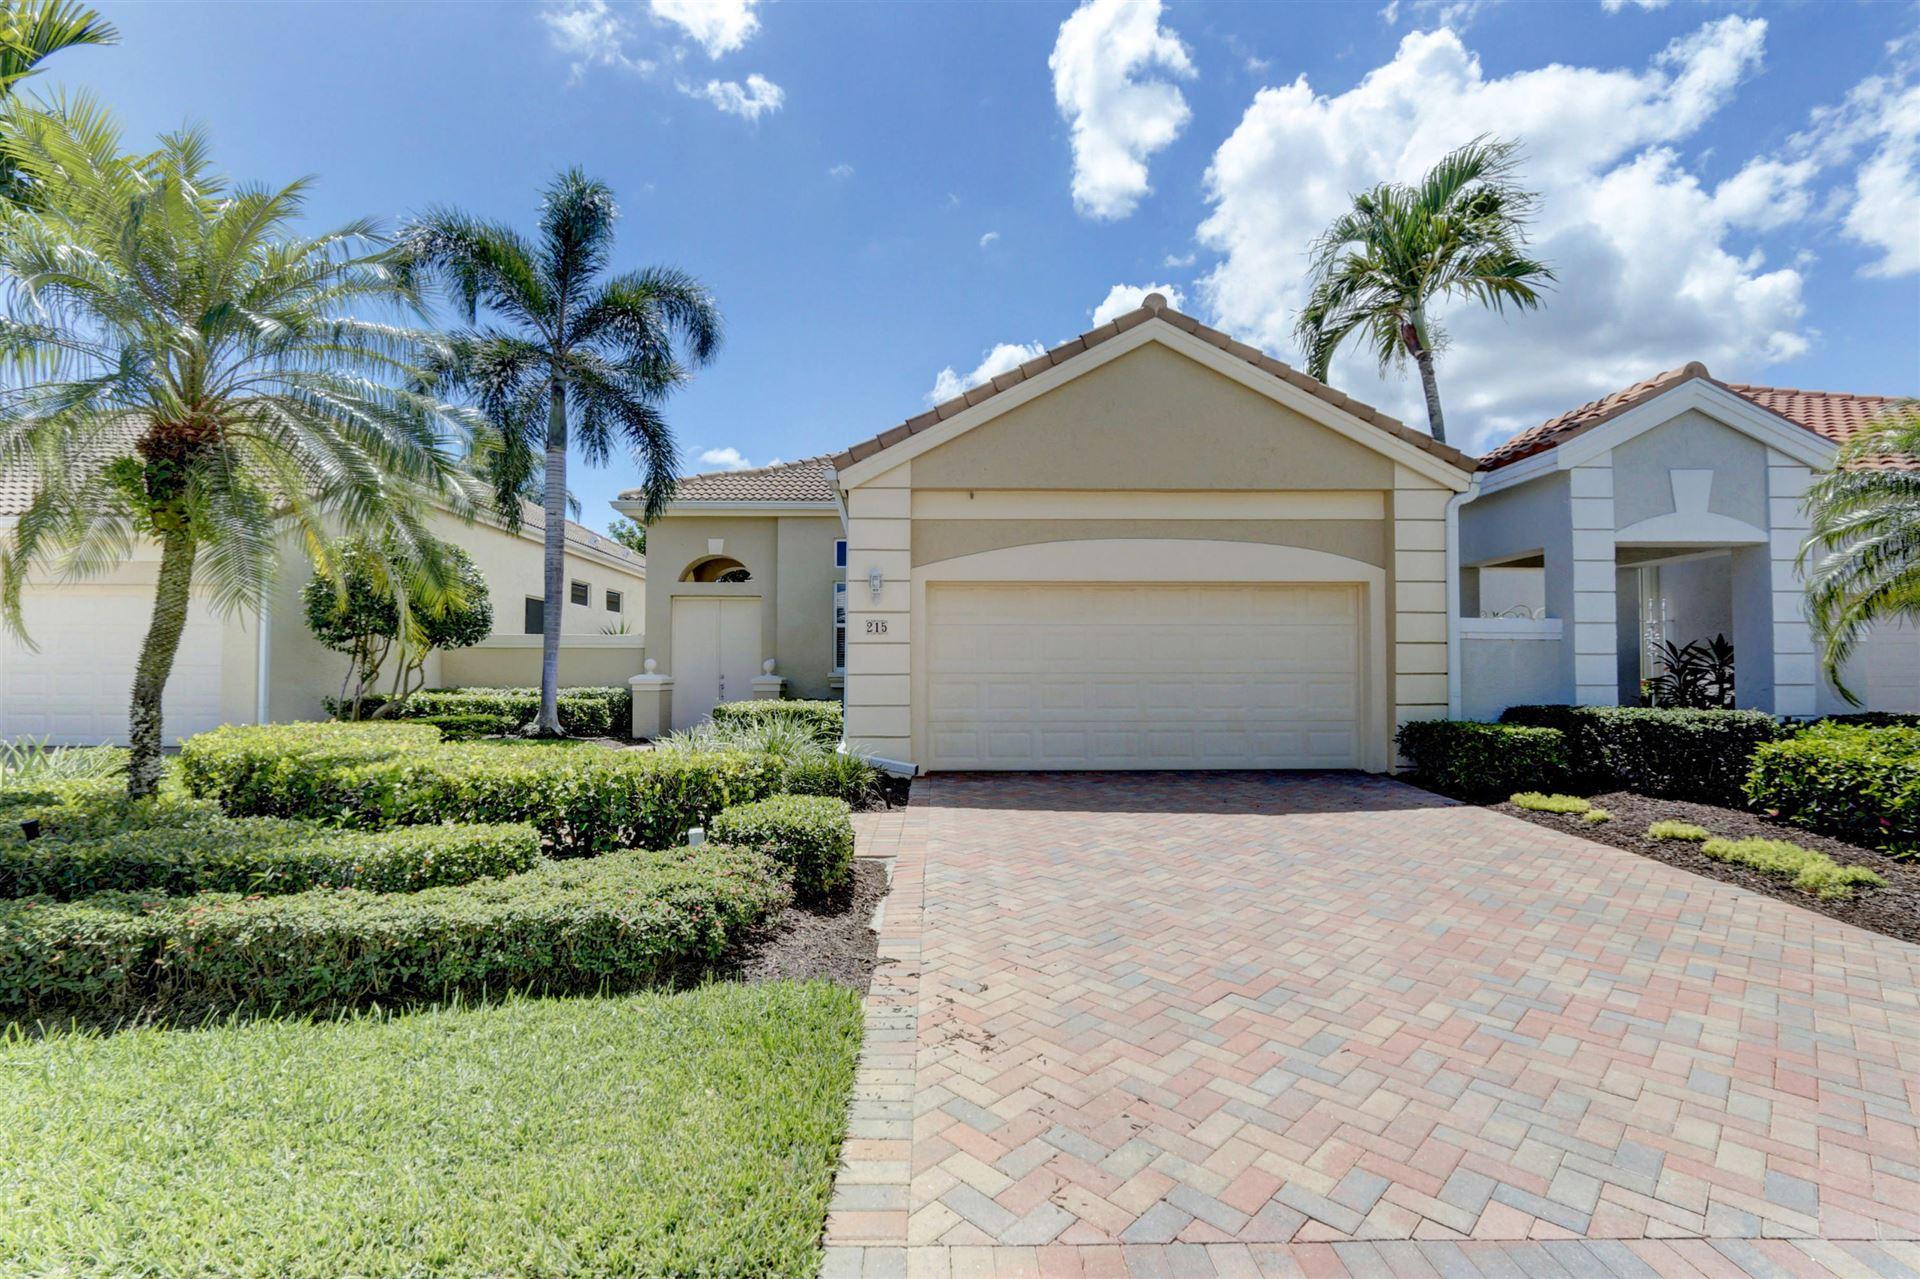 Photo of 215 Coral Cay Terrace, Palm Beach Gardens, FL 33418 (MLS # RX-10651339)